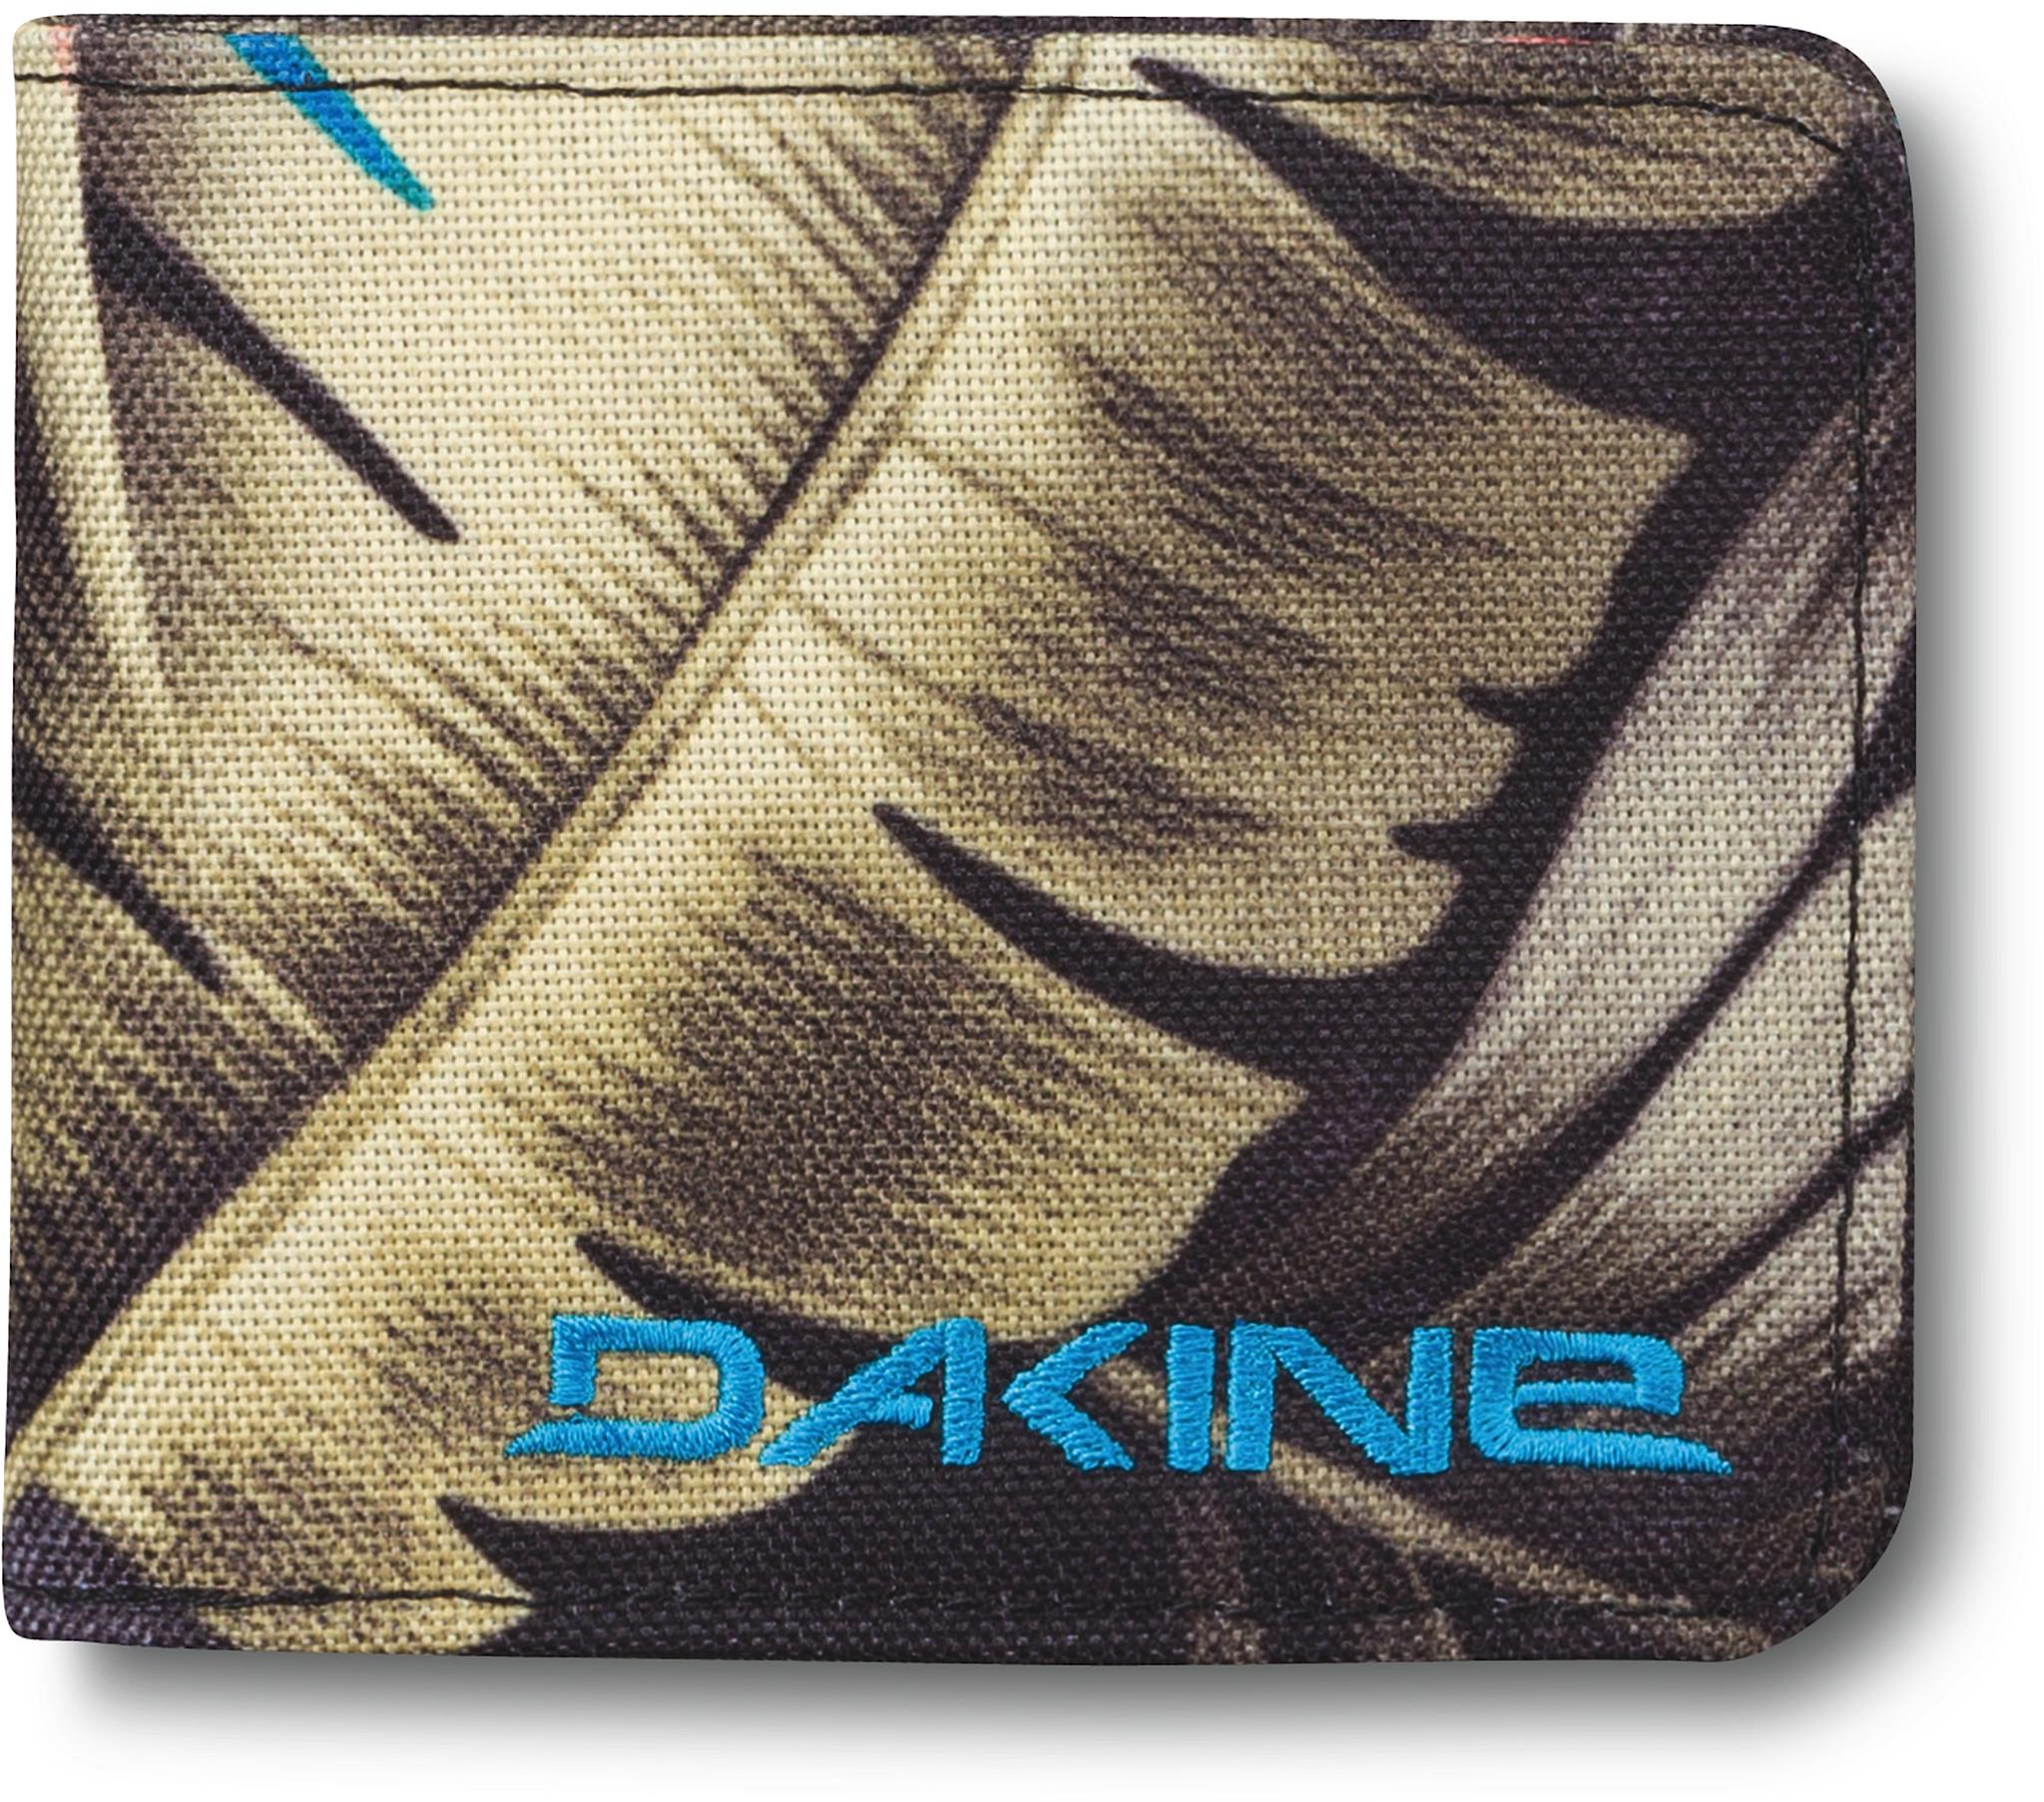 Спортивные кошельки Кошелек Dakine PAYBACK WALLET PALM 2015S-08820117-PaybackWallet-Palm.jpg